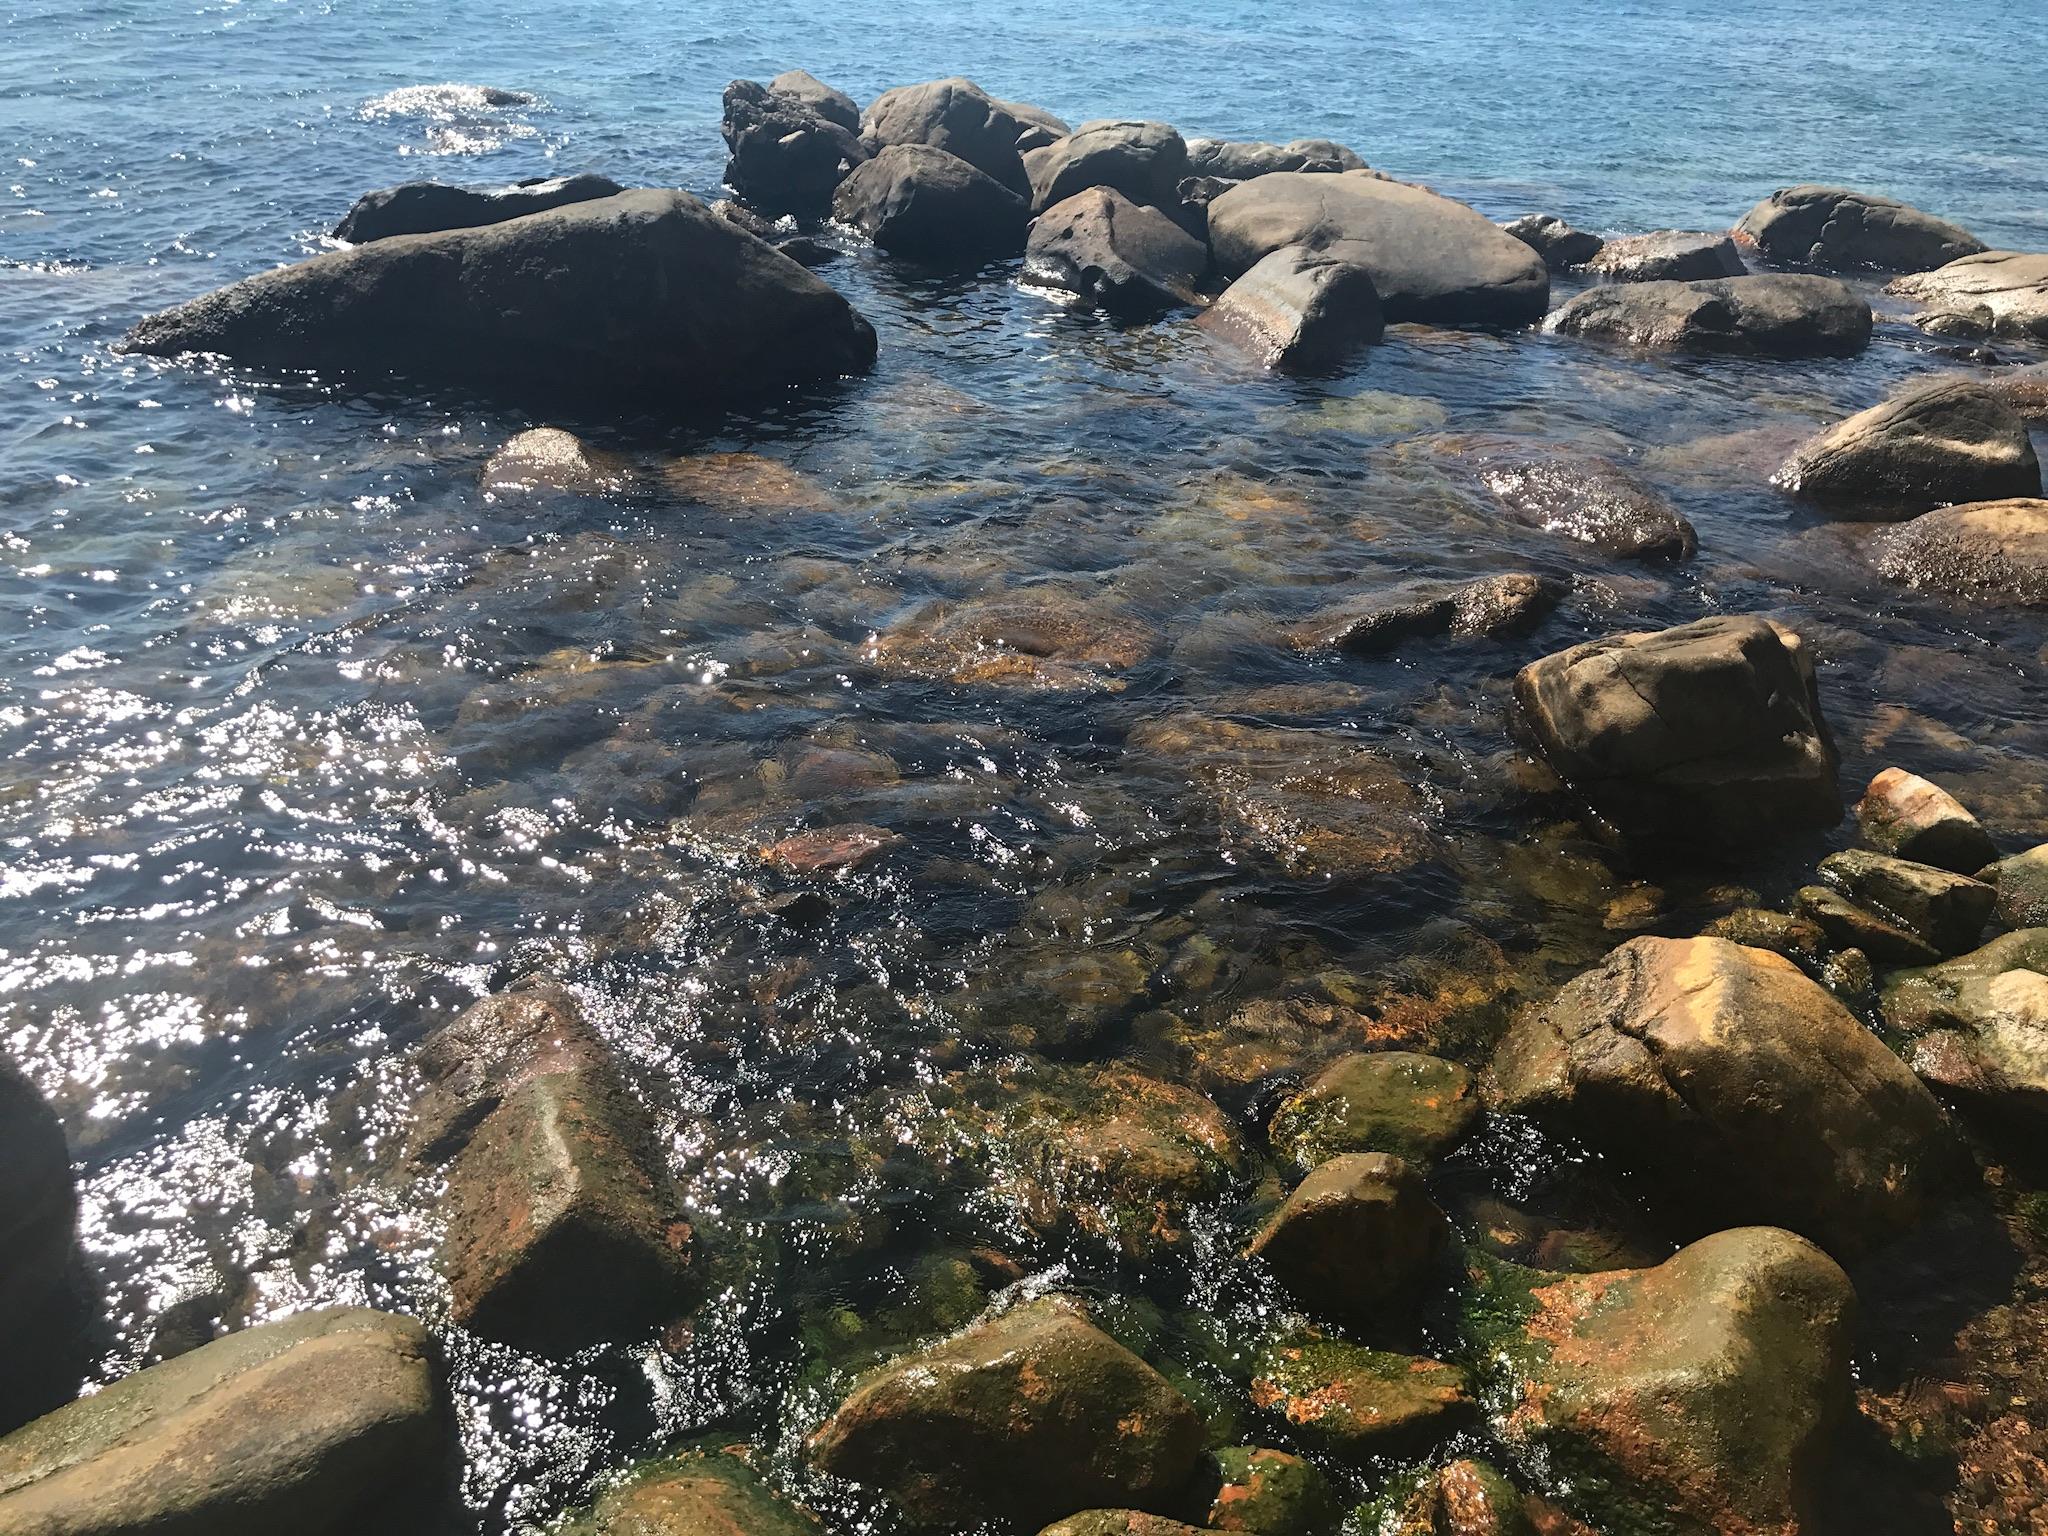 Lefkada thermal hot spring by the sea   Credit: Talita Bateman